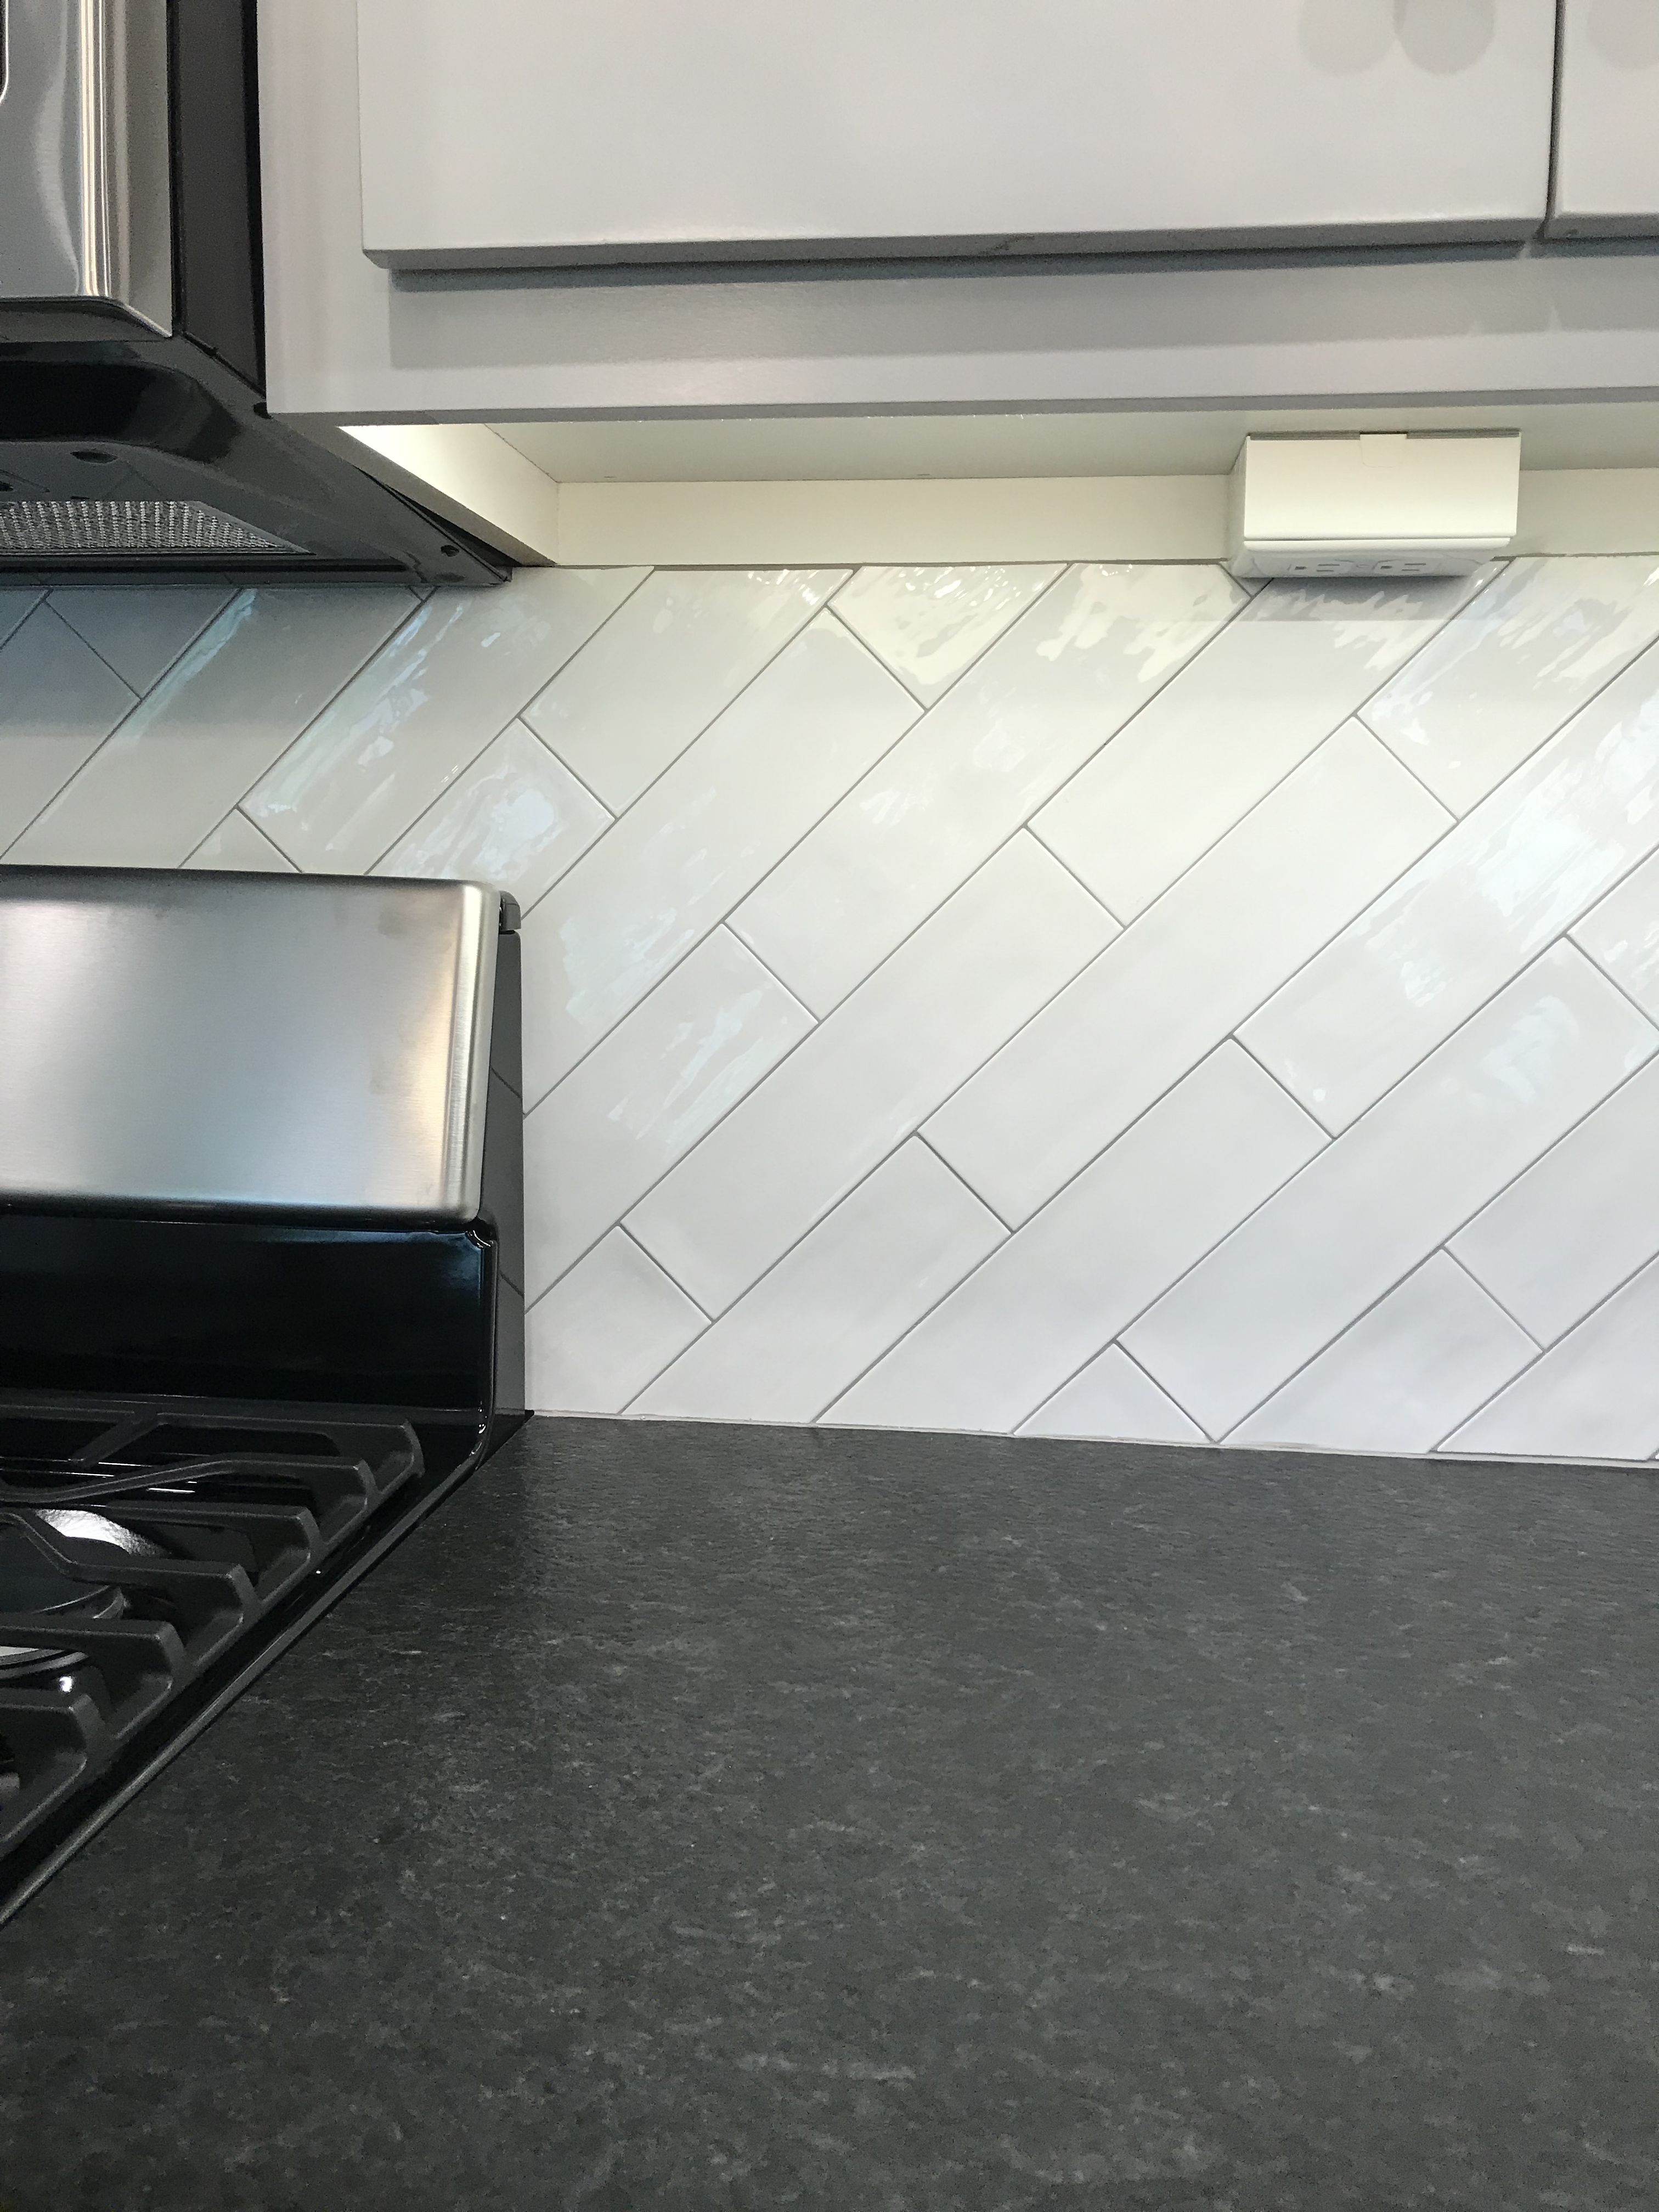 Diagonal Tile Backsplash Tile Backsplash Tile Layout Patterned Kitchen Tiles